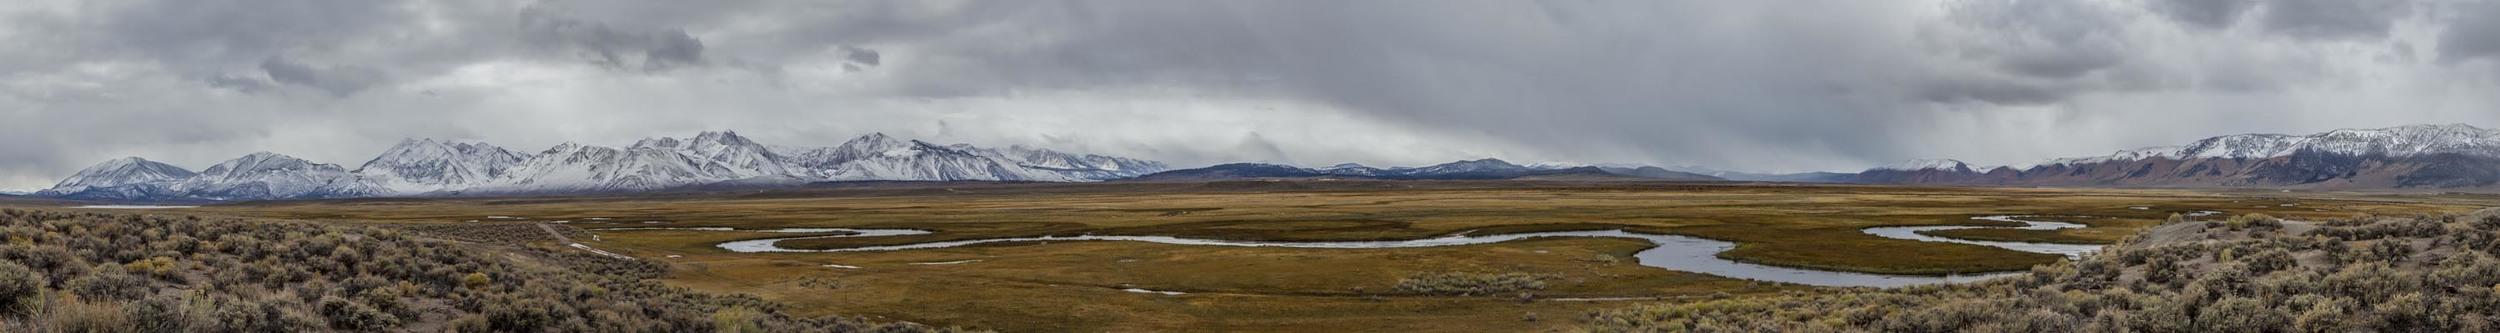 Upper Owens & Eastern Sierras, first snow of 2011 winter, take 2.jpg